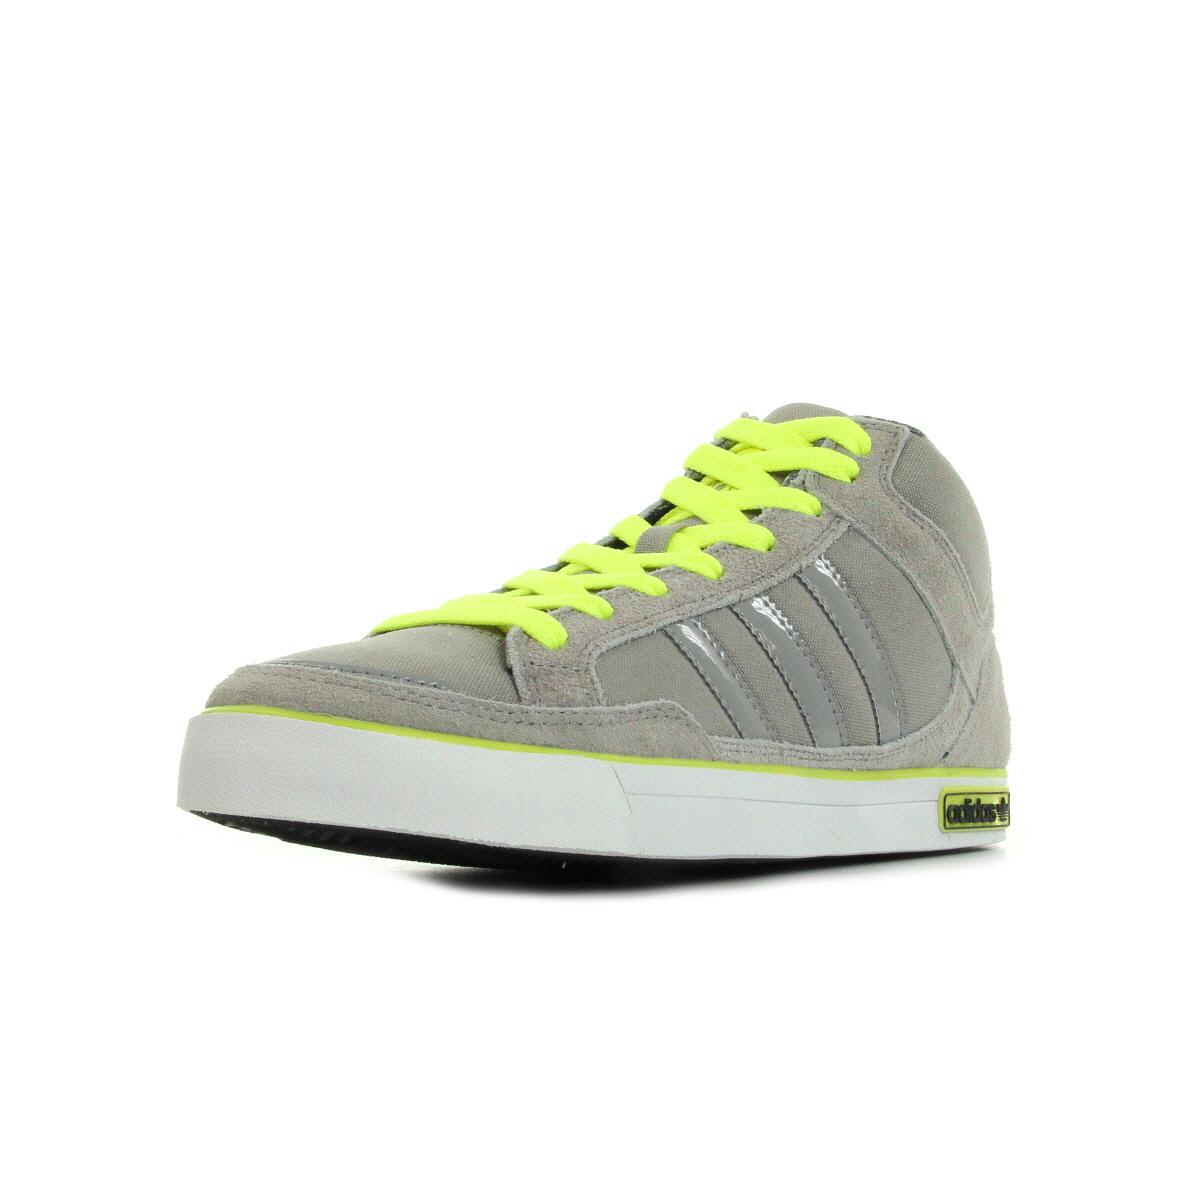 Chaussures Baskets adidas homme VC 1000 taille Gris Grise Textile Lacets